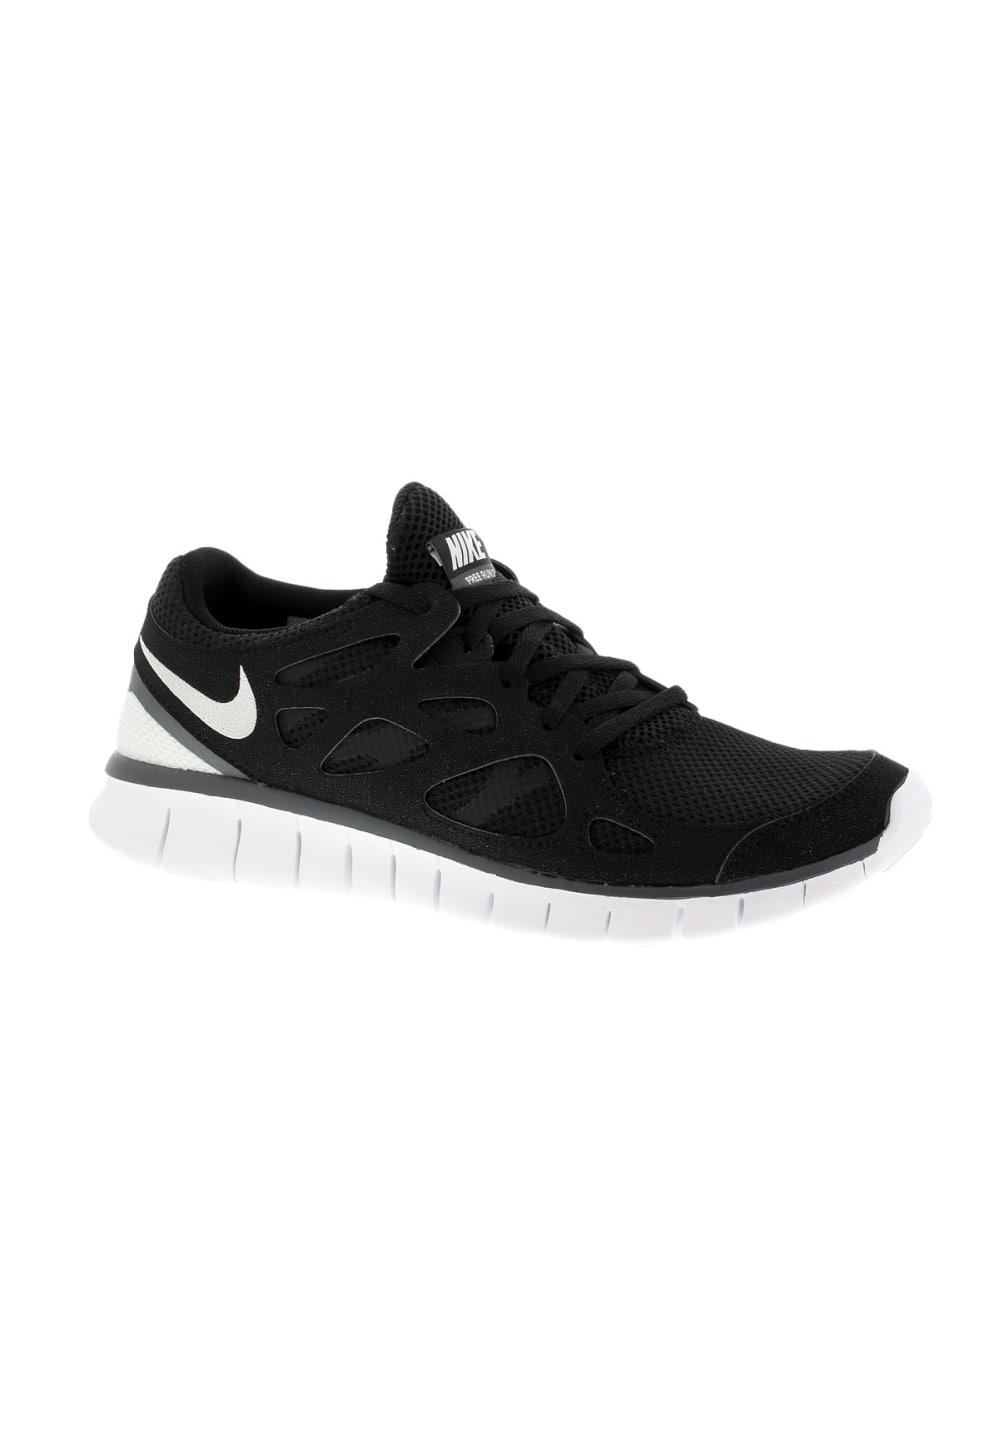 revendeur 1d915 173a2 Nike Free Run 2 EXT - Running shoes for Women - Black